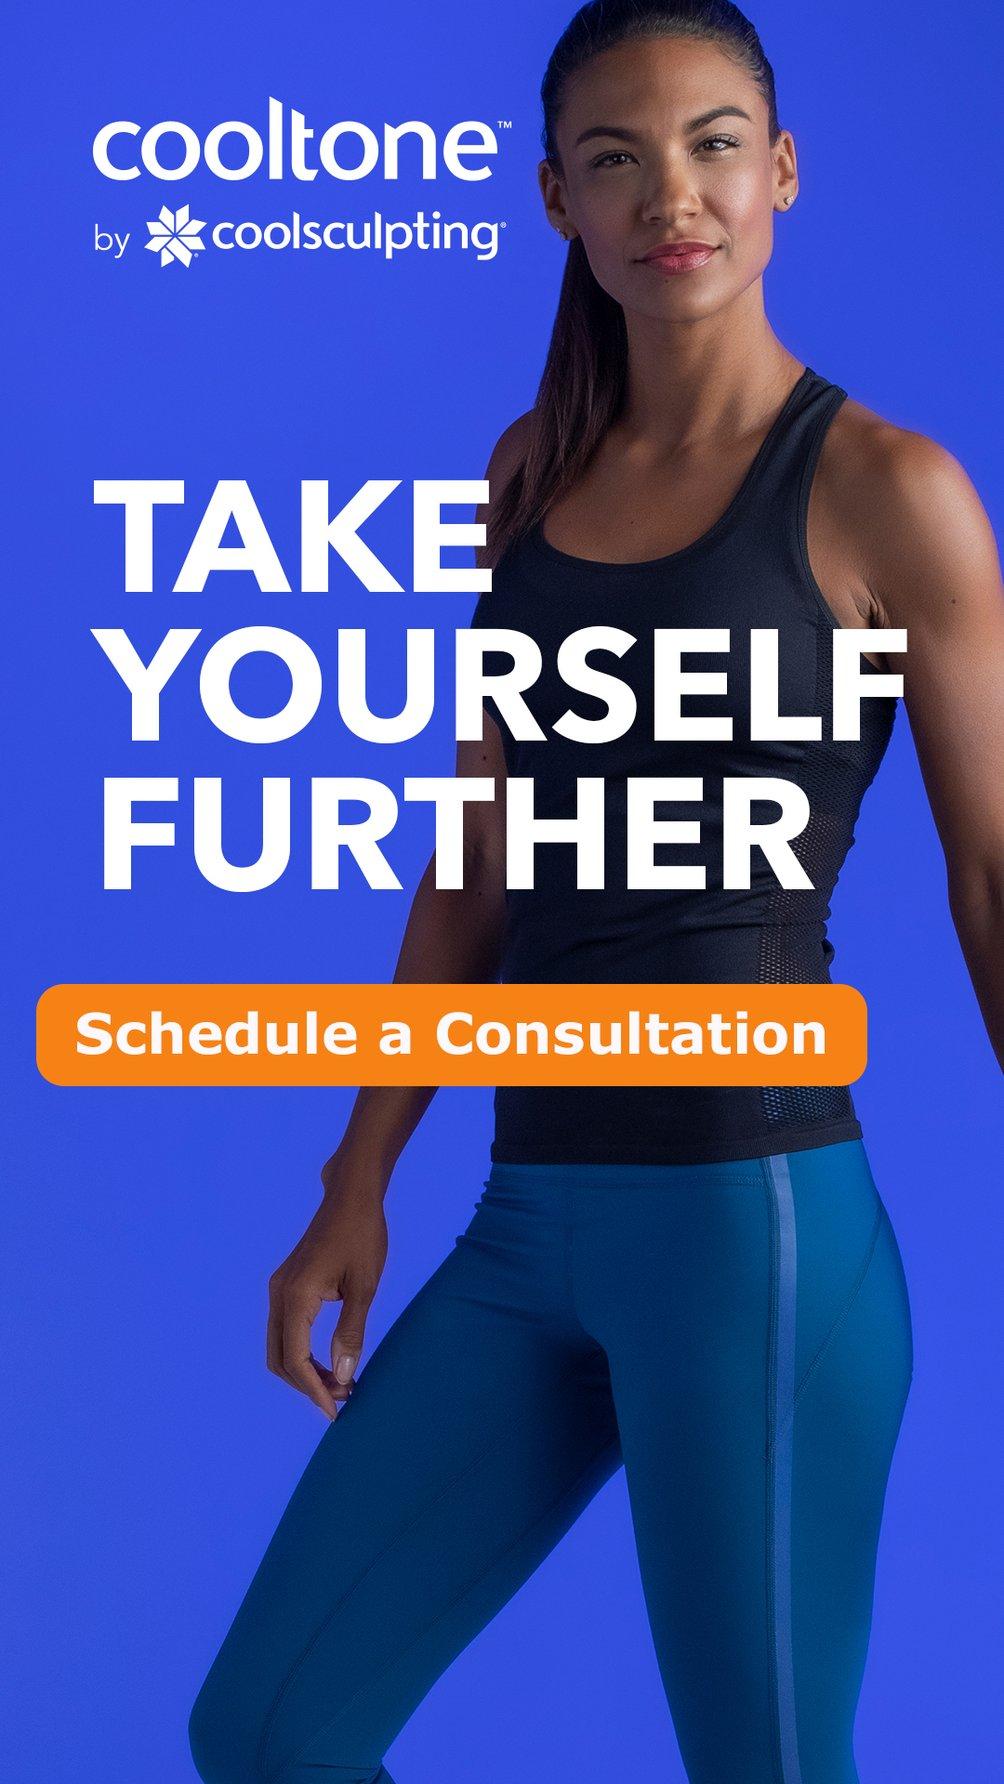 CoolTone Orlando Get Free Consultation